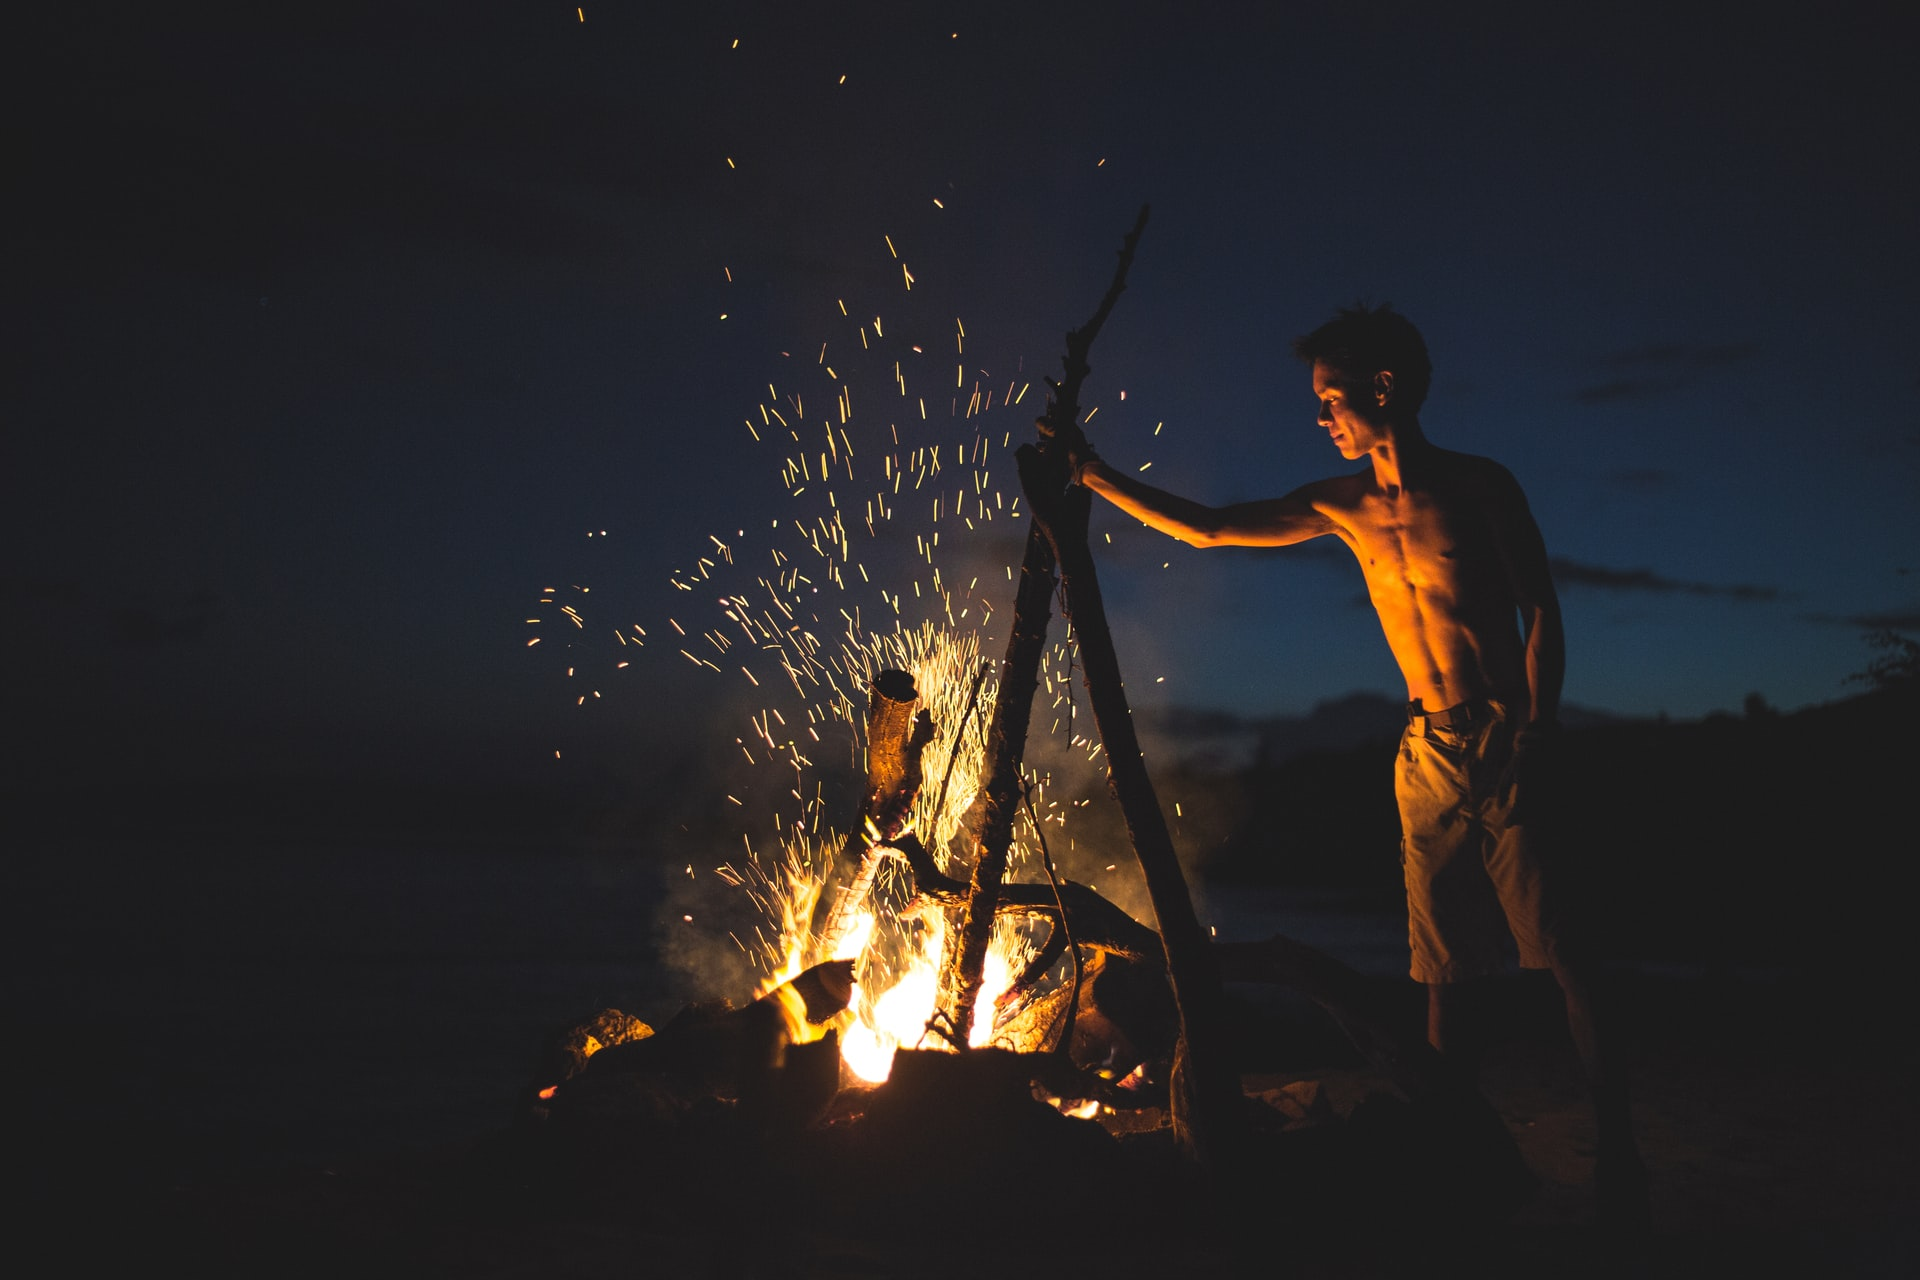 Getting the fire started (photo: Jon Asato)